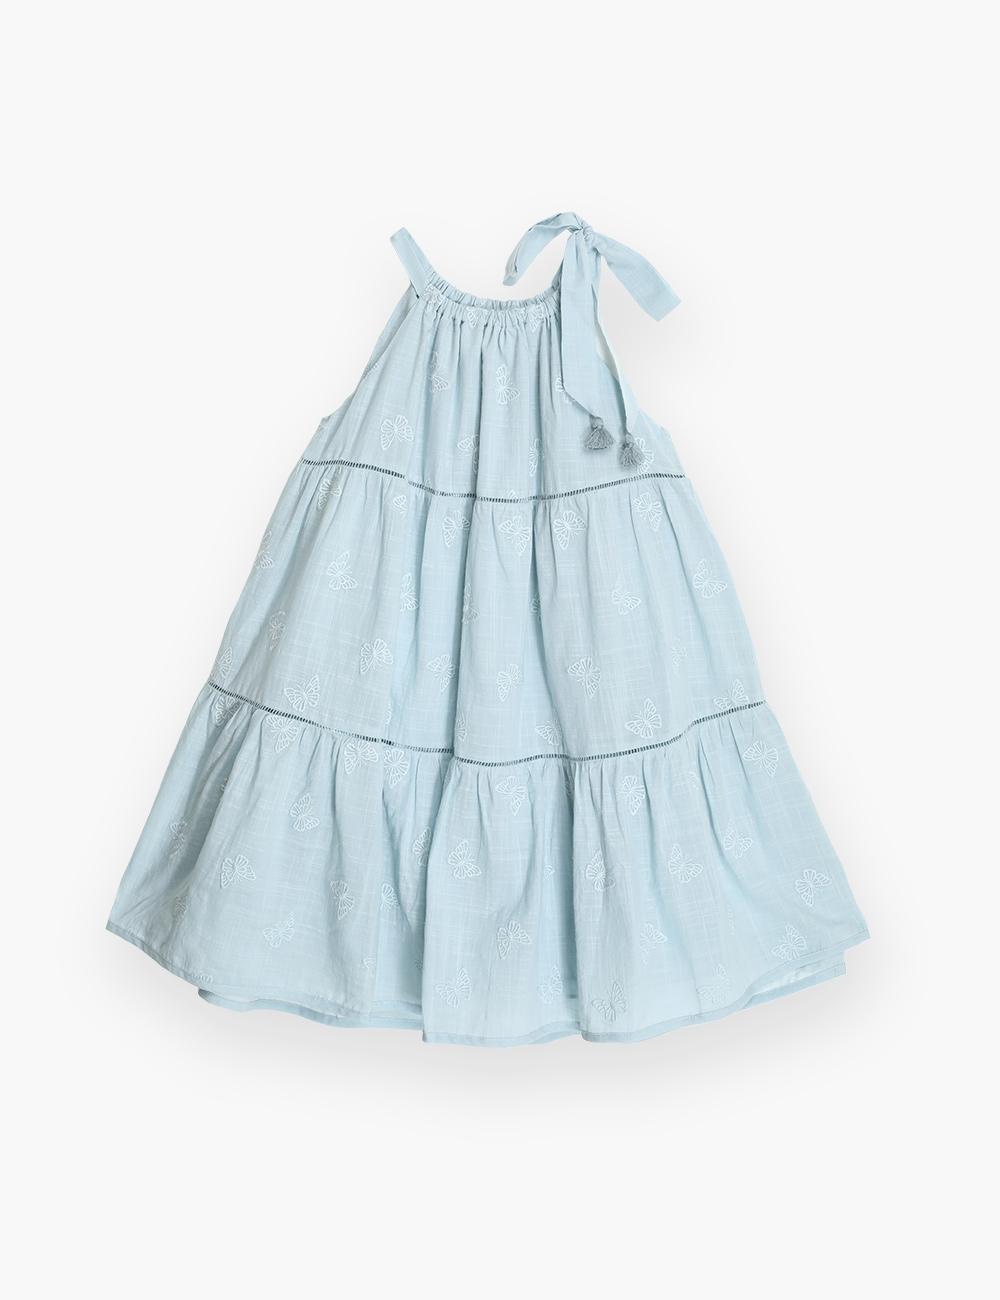 Andie Tie Shoulder Dress